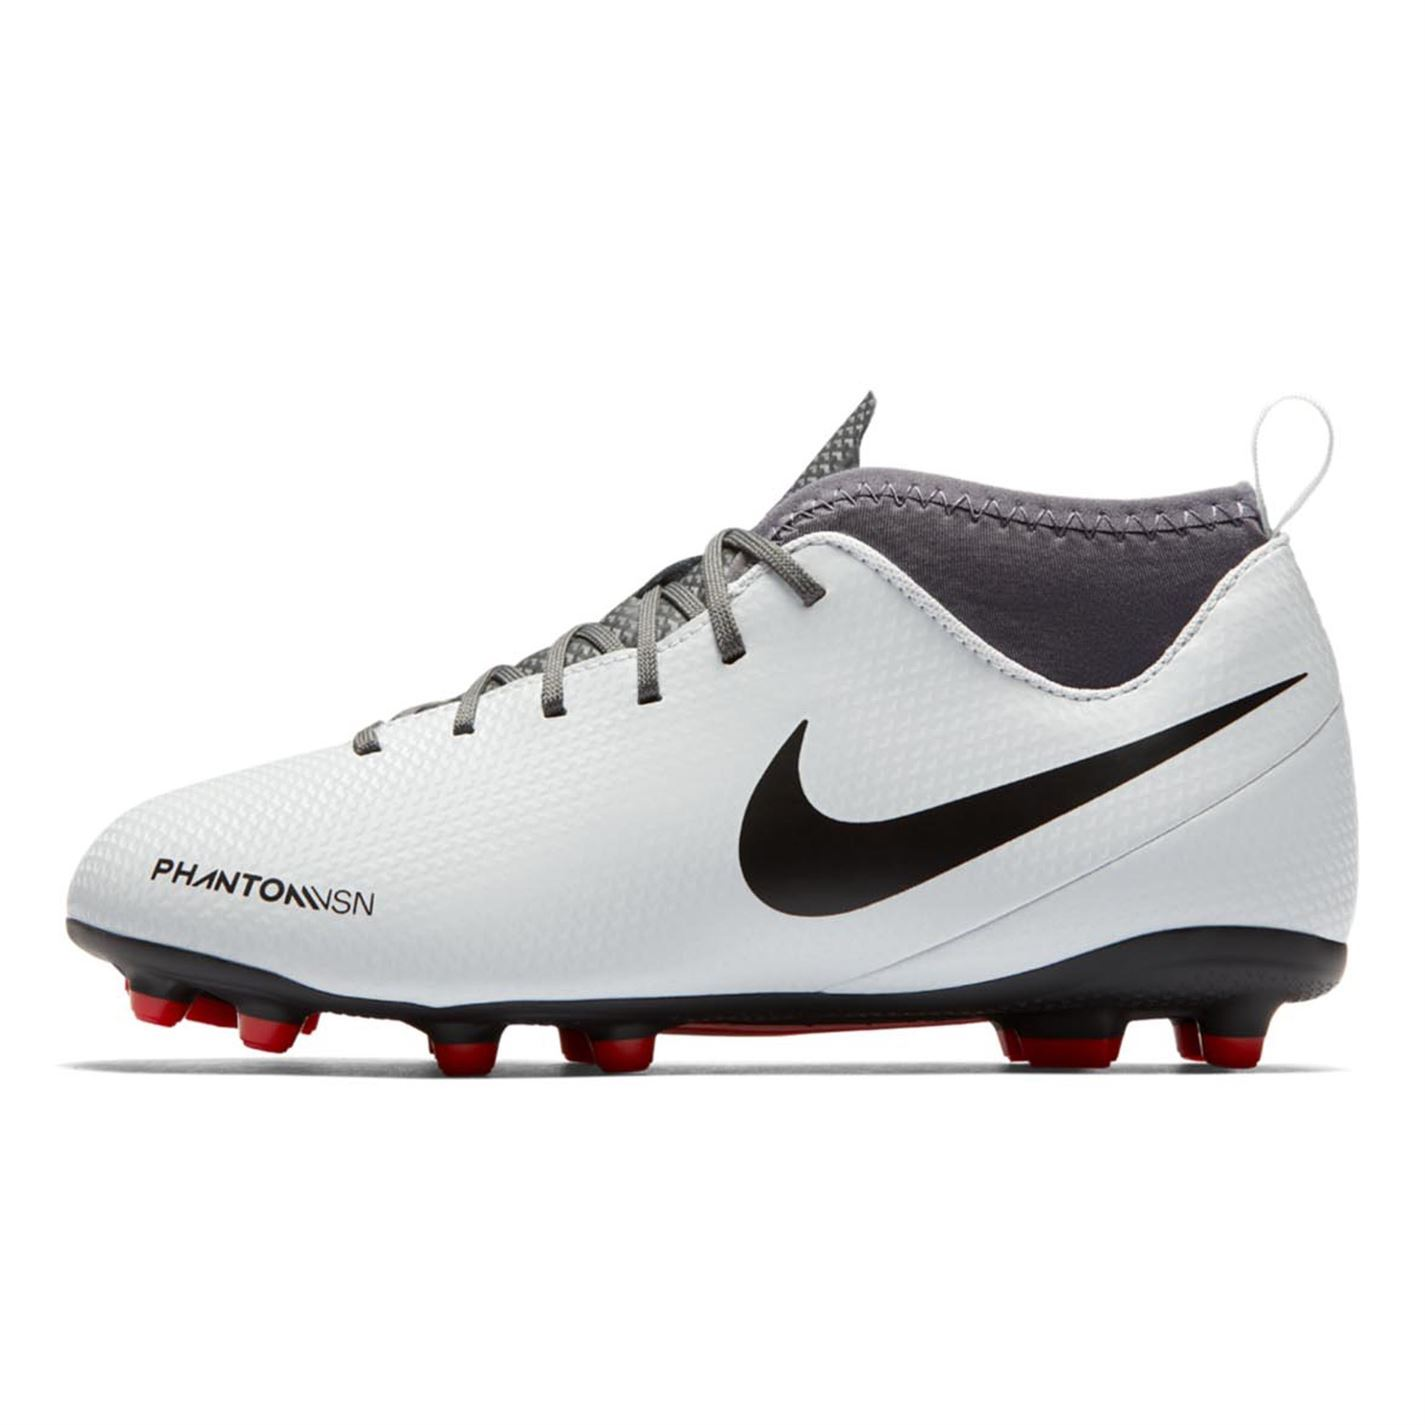 miniature 11 - Nike-Phantom-Vision-Club-DF-FG-Firm-Ground-Chaussures-De-Football-Juniors-Football-Crampons